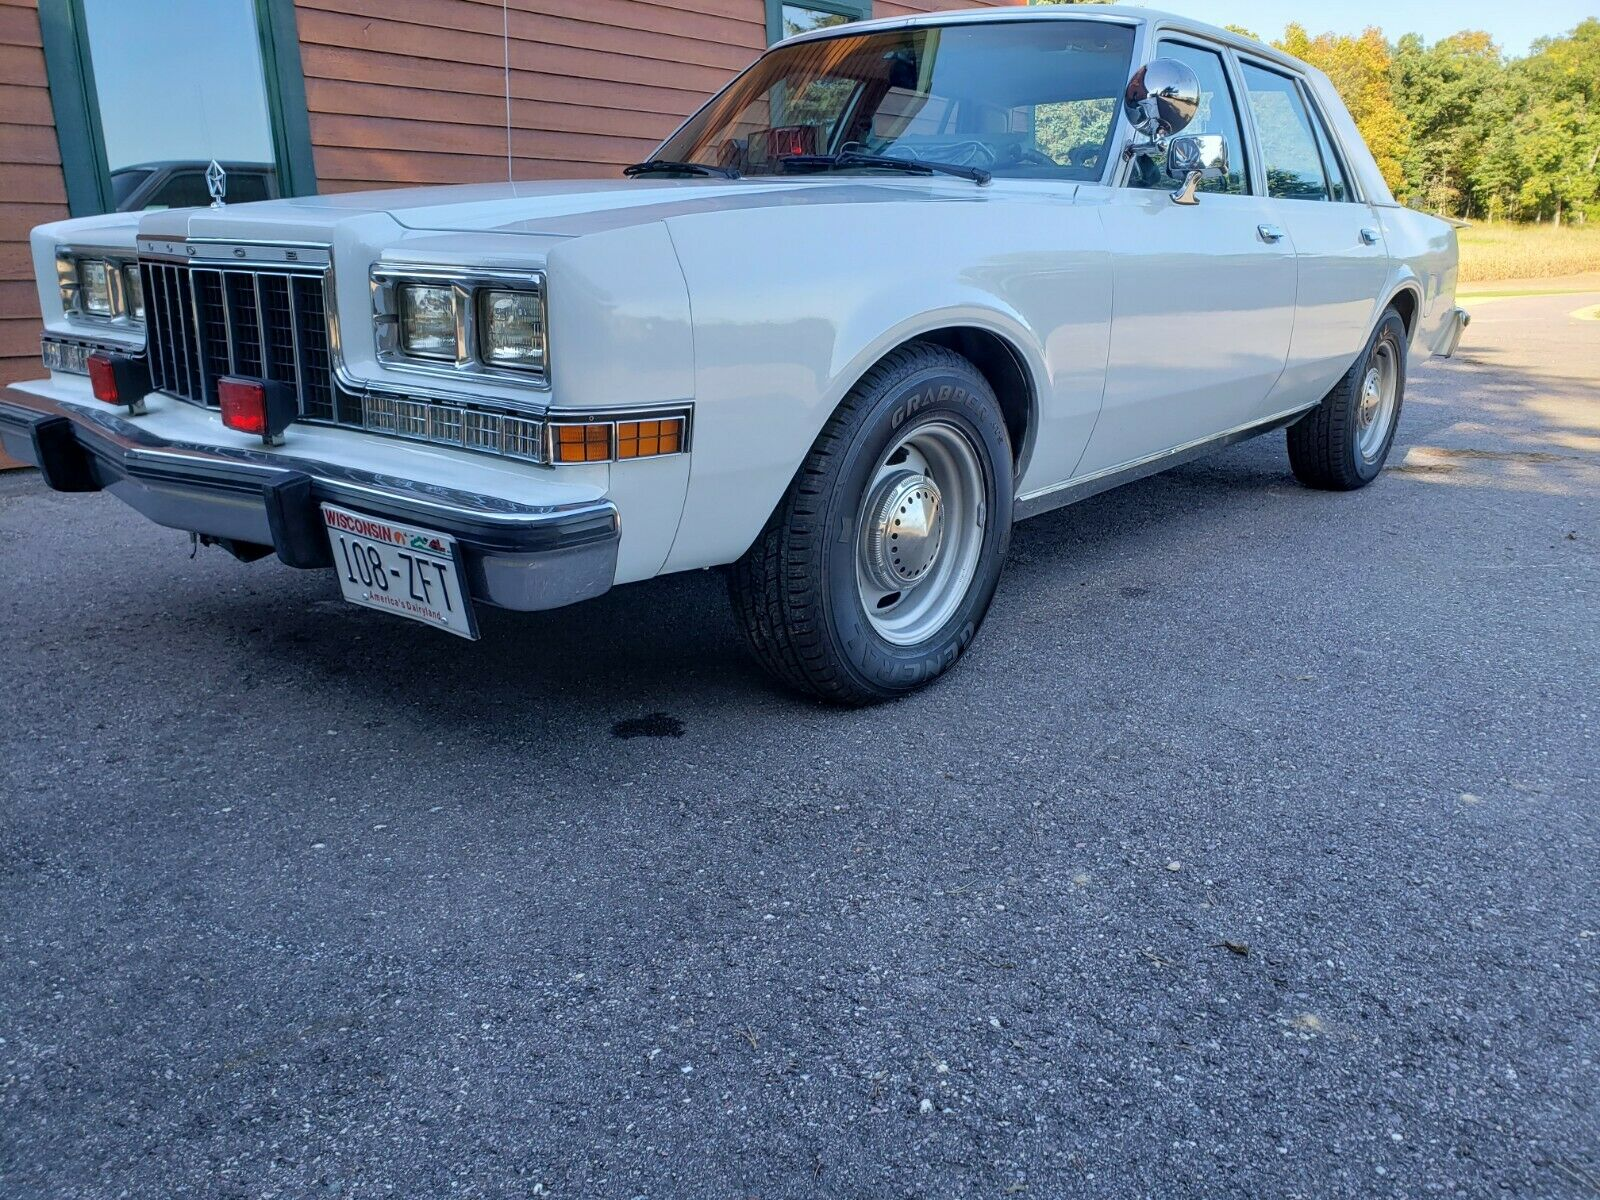 Vanilla Vice: 1989 Dodge Diplomat AHB – Clean As A Whistle!